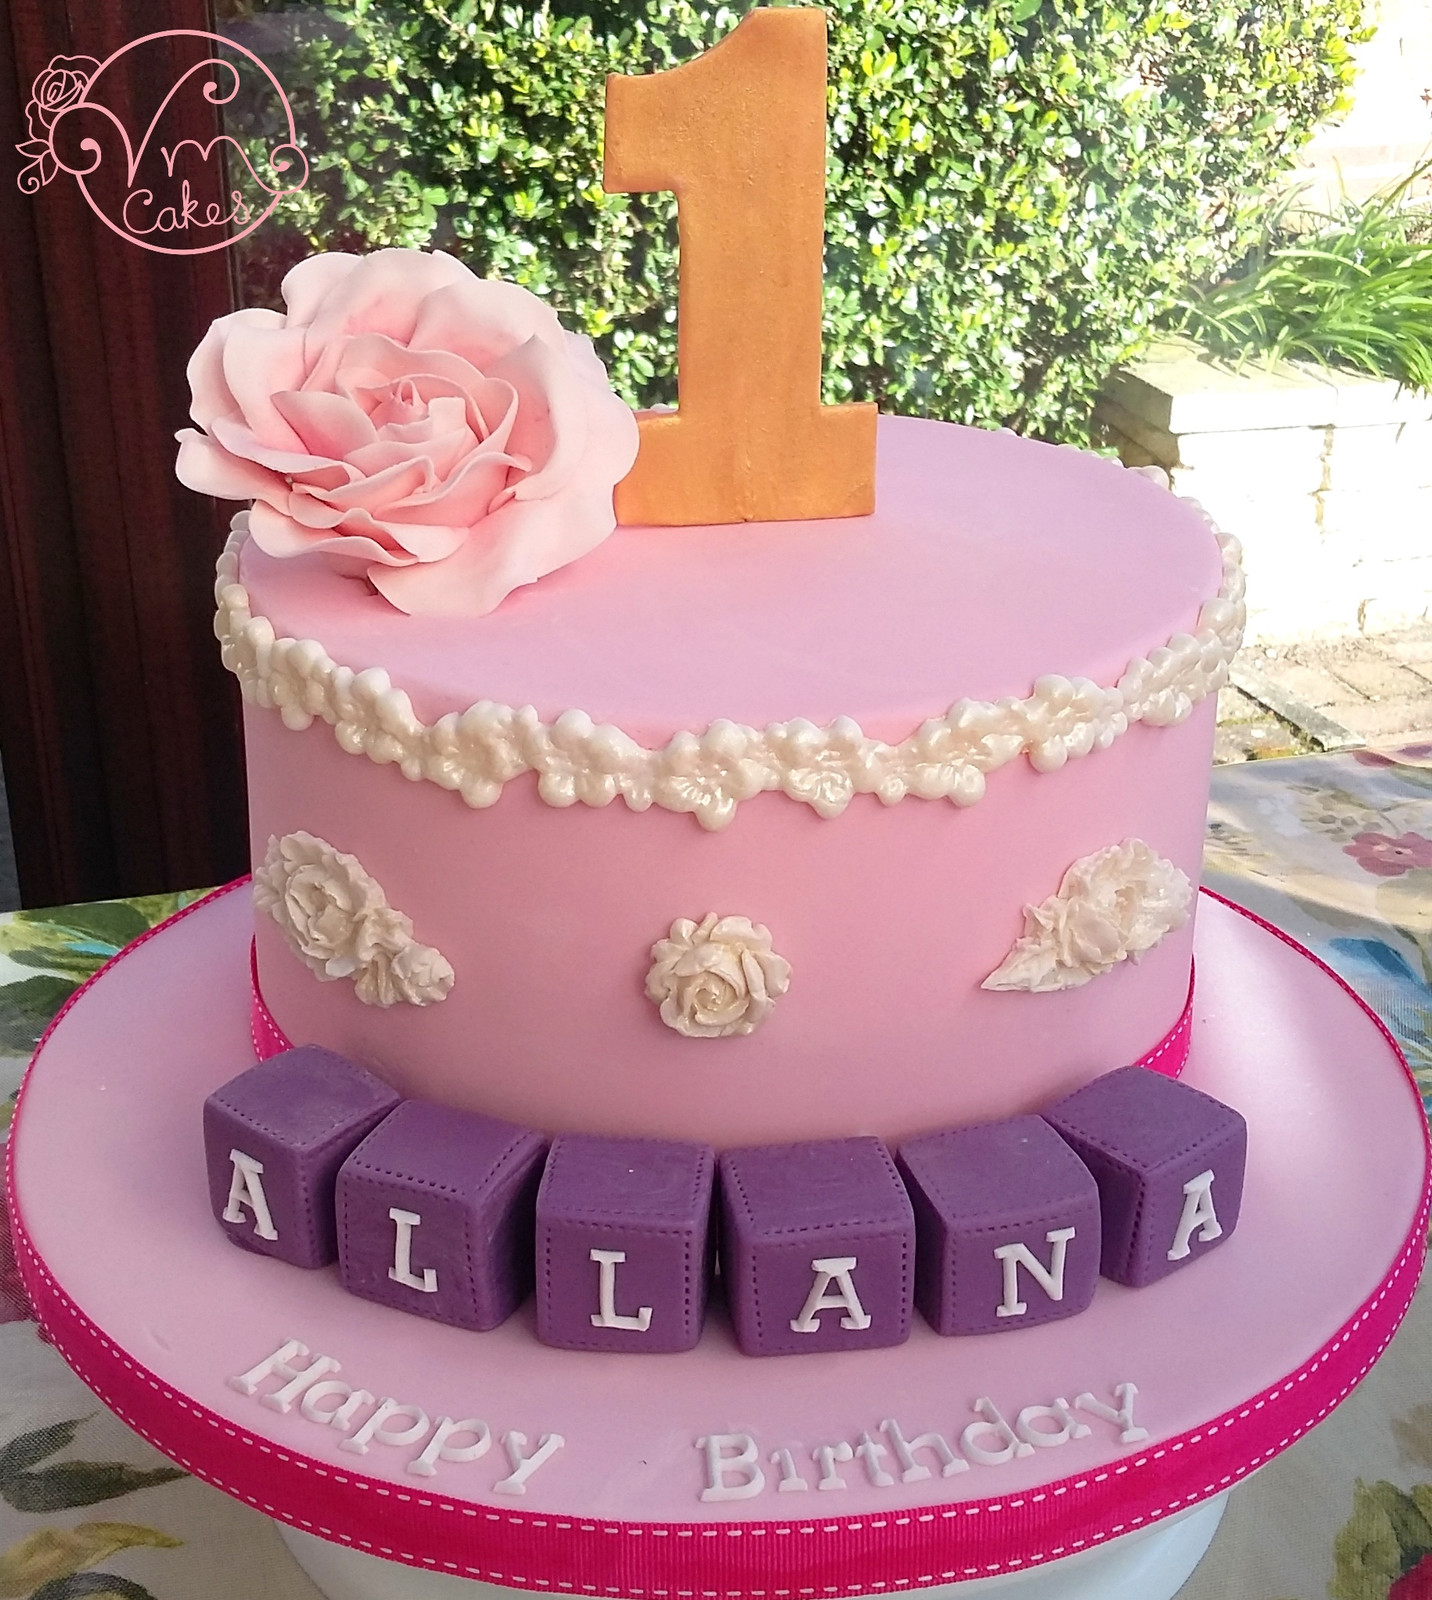 VM Cakes | Celebratory Cakes in Norwich